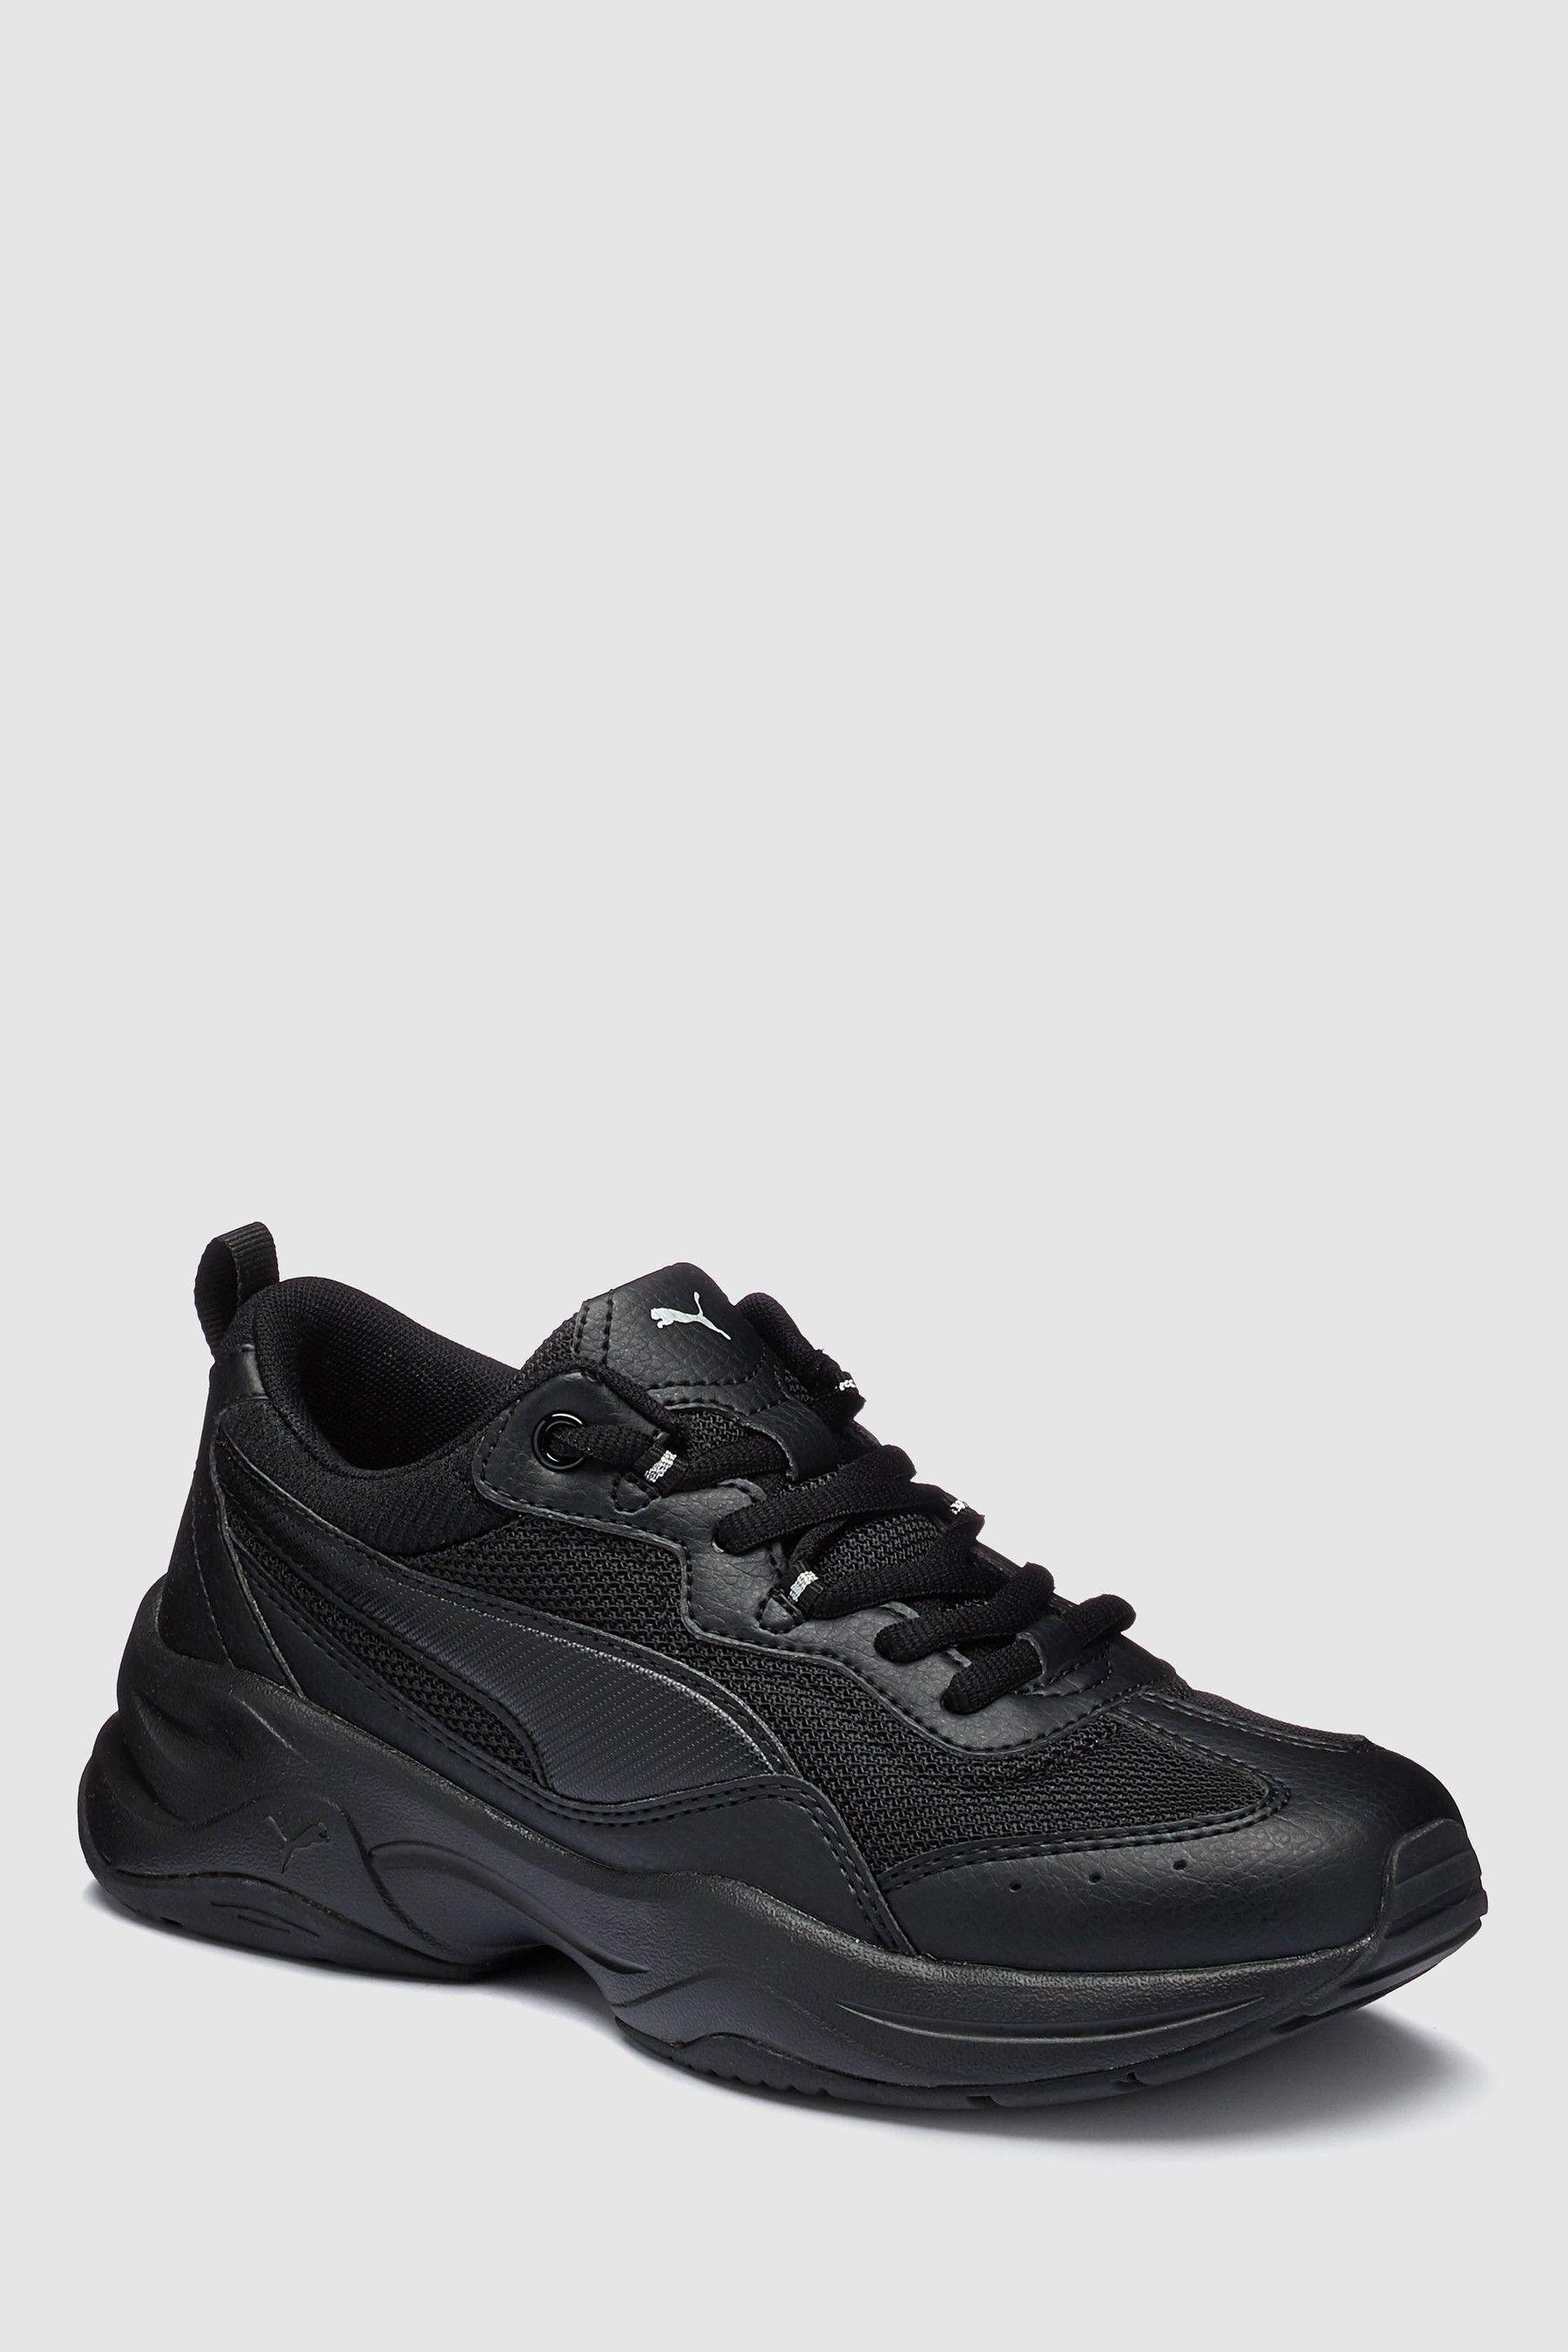 Womens Puma Cilia Trainer Black | All black sneakers, Puma